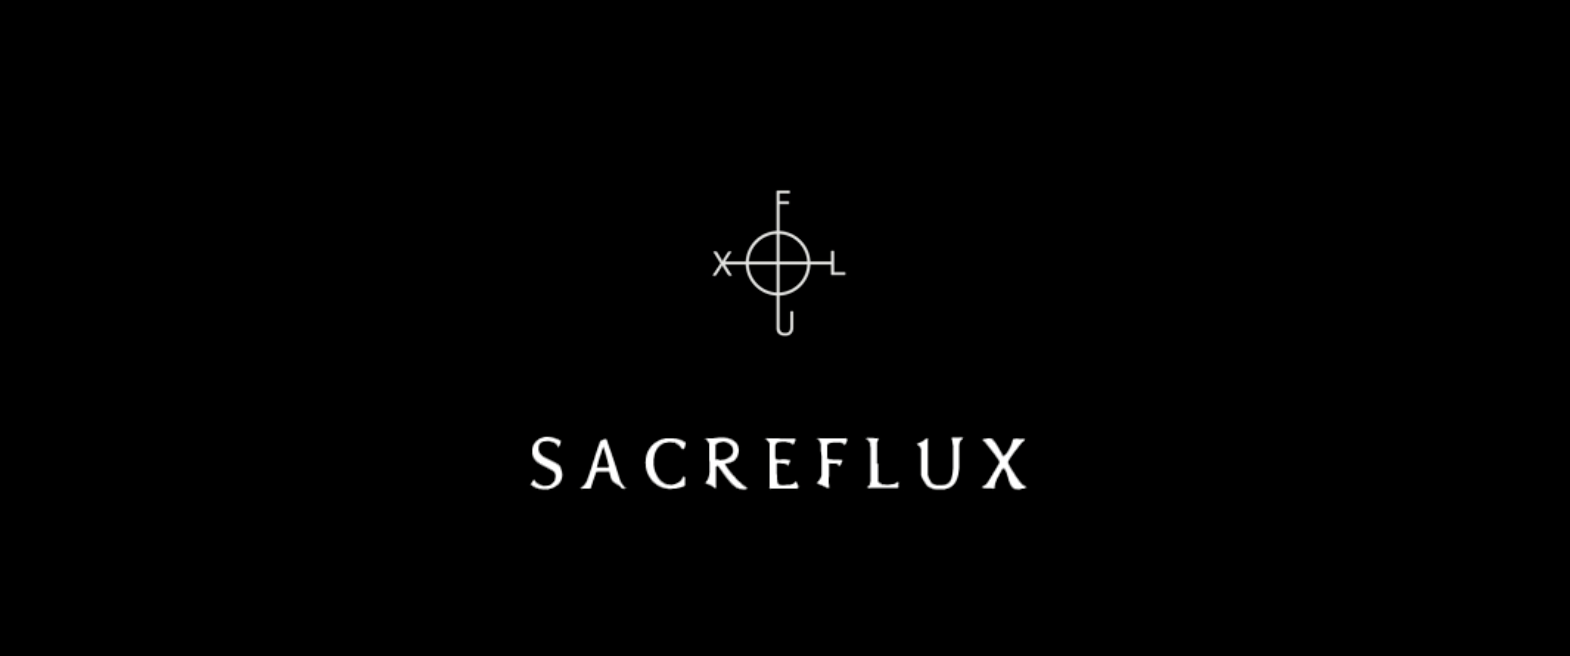 Sacreflux